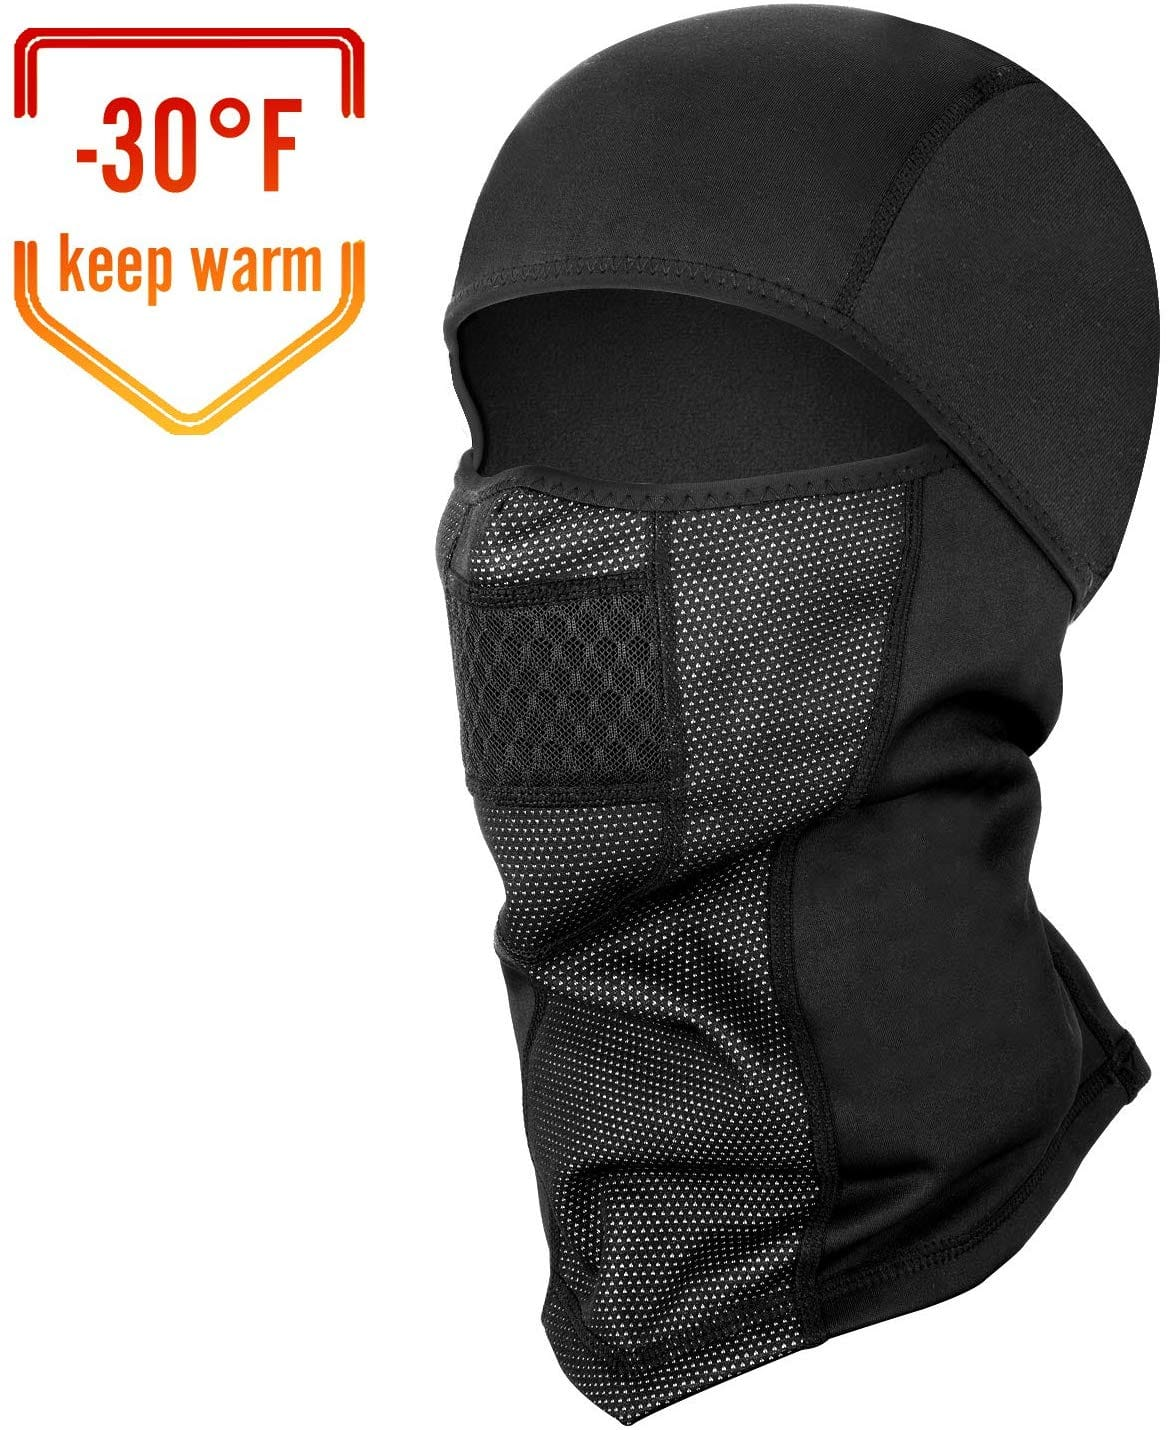 Ski Mask, Thermal Full Face Mask for Winter Sports Skiing, Snowboarding, Motorcycling, Windproof Ski Hood (Black) - $8.39